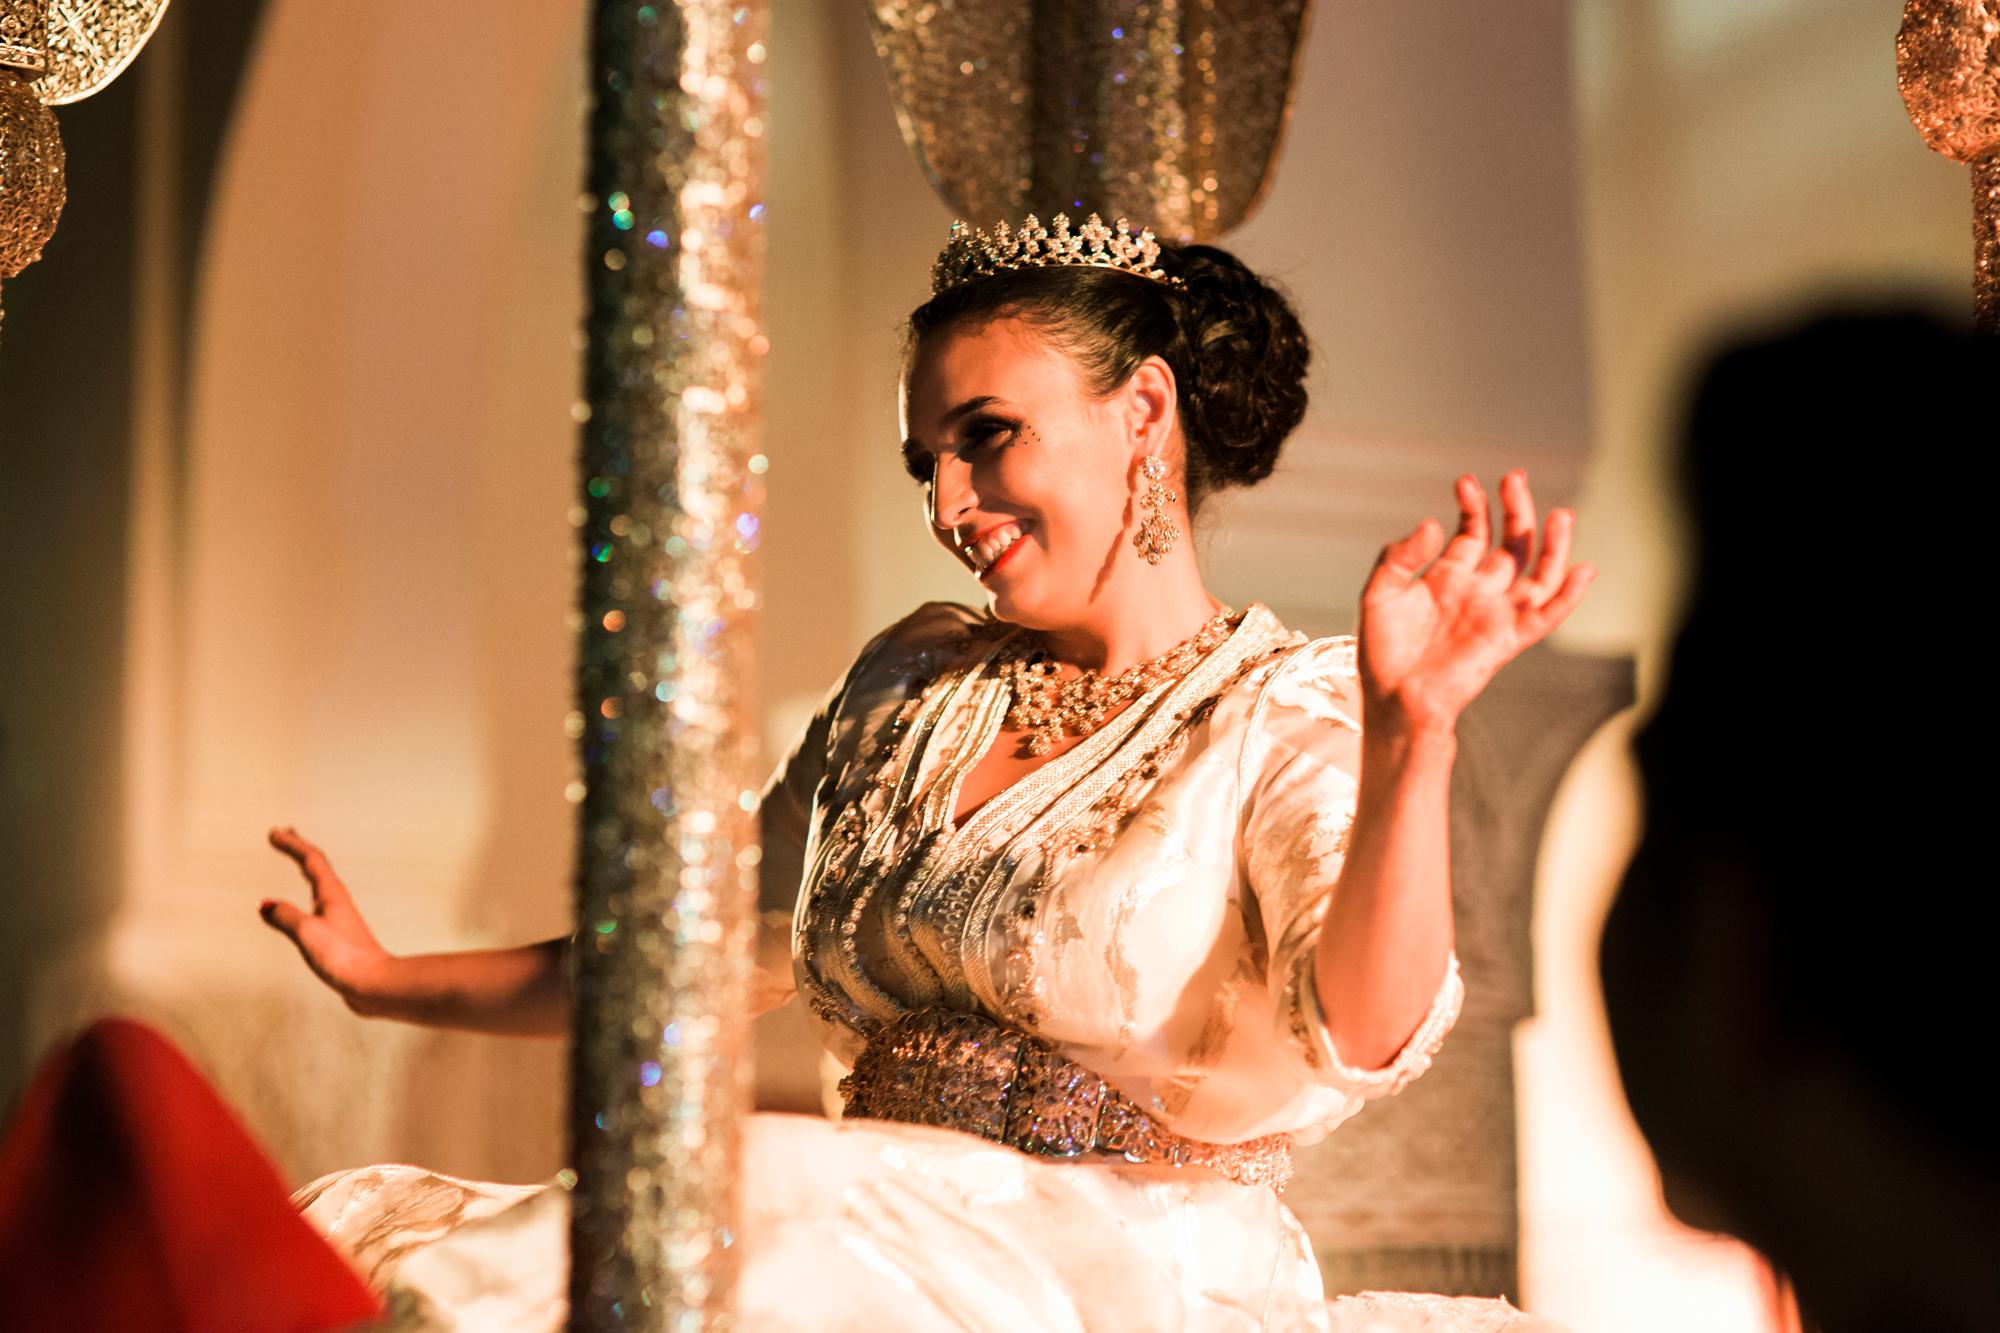 marrakech-morocco-destination-wedding-lilouette-26.jpg